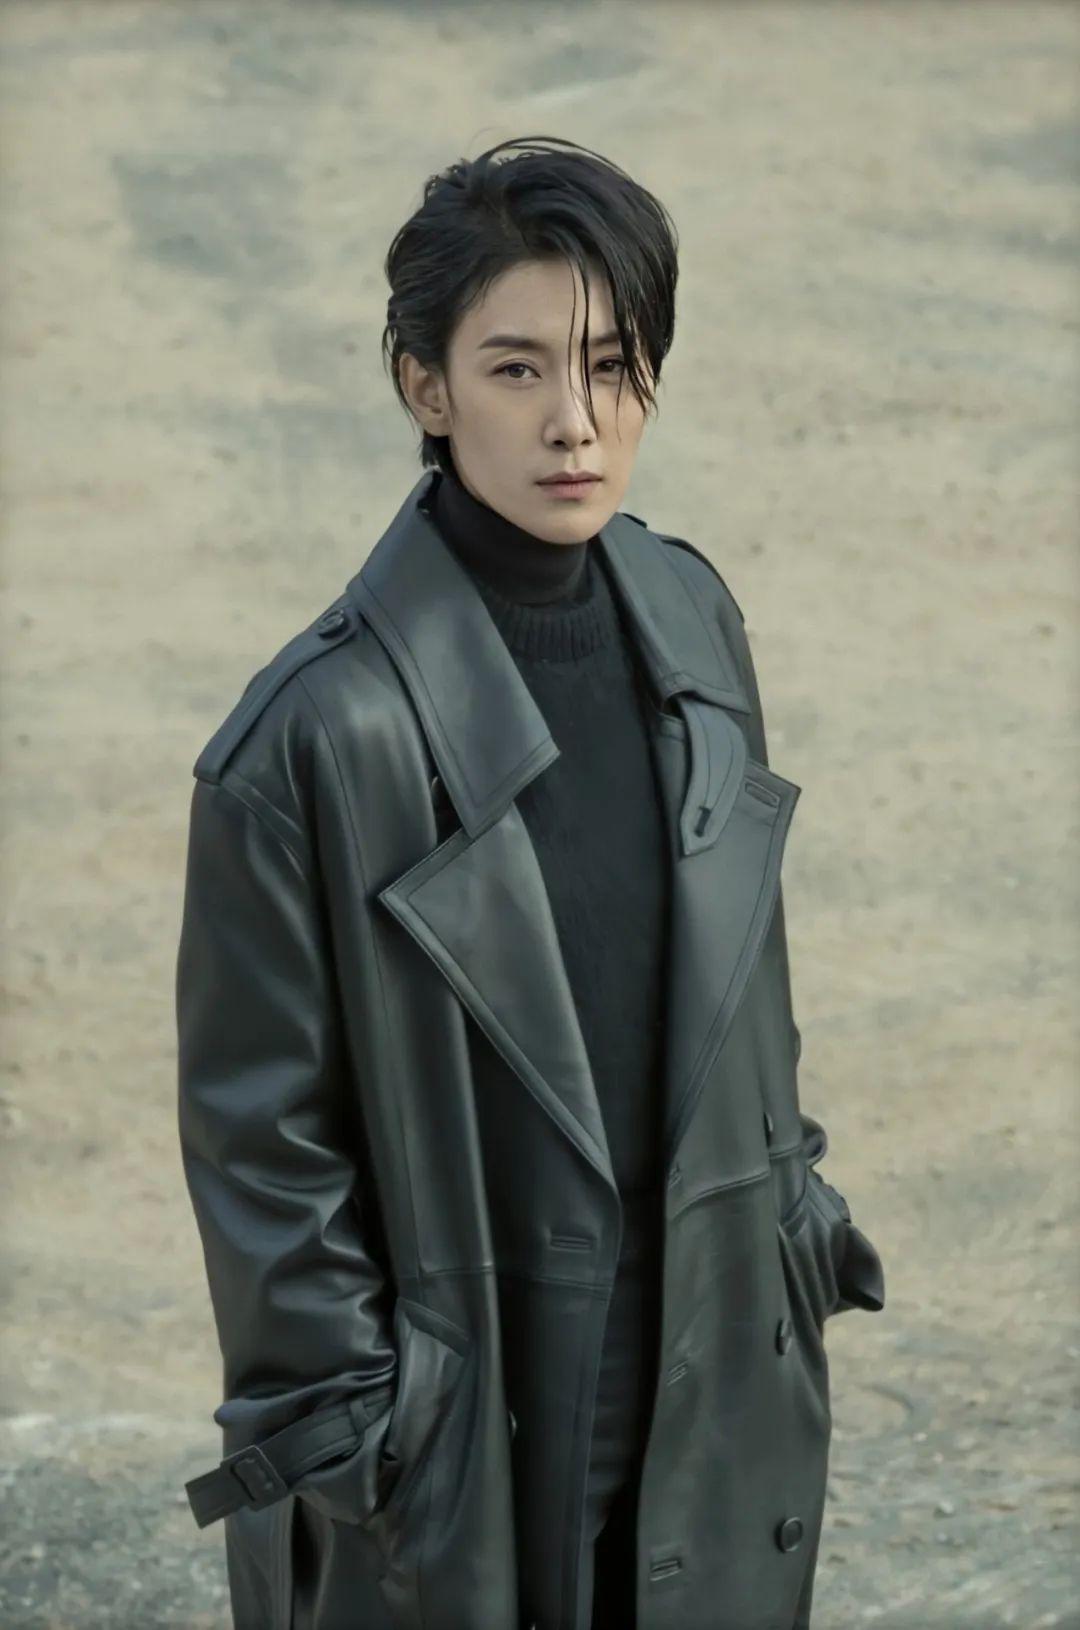 dien vien kim seo hyung elle 22